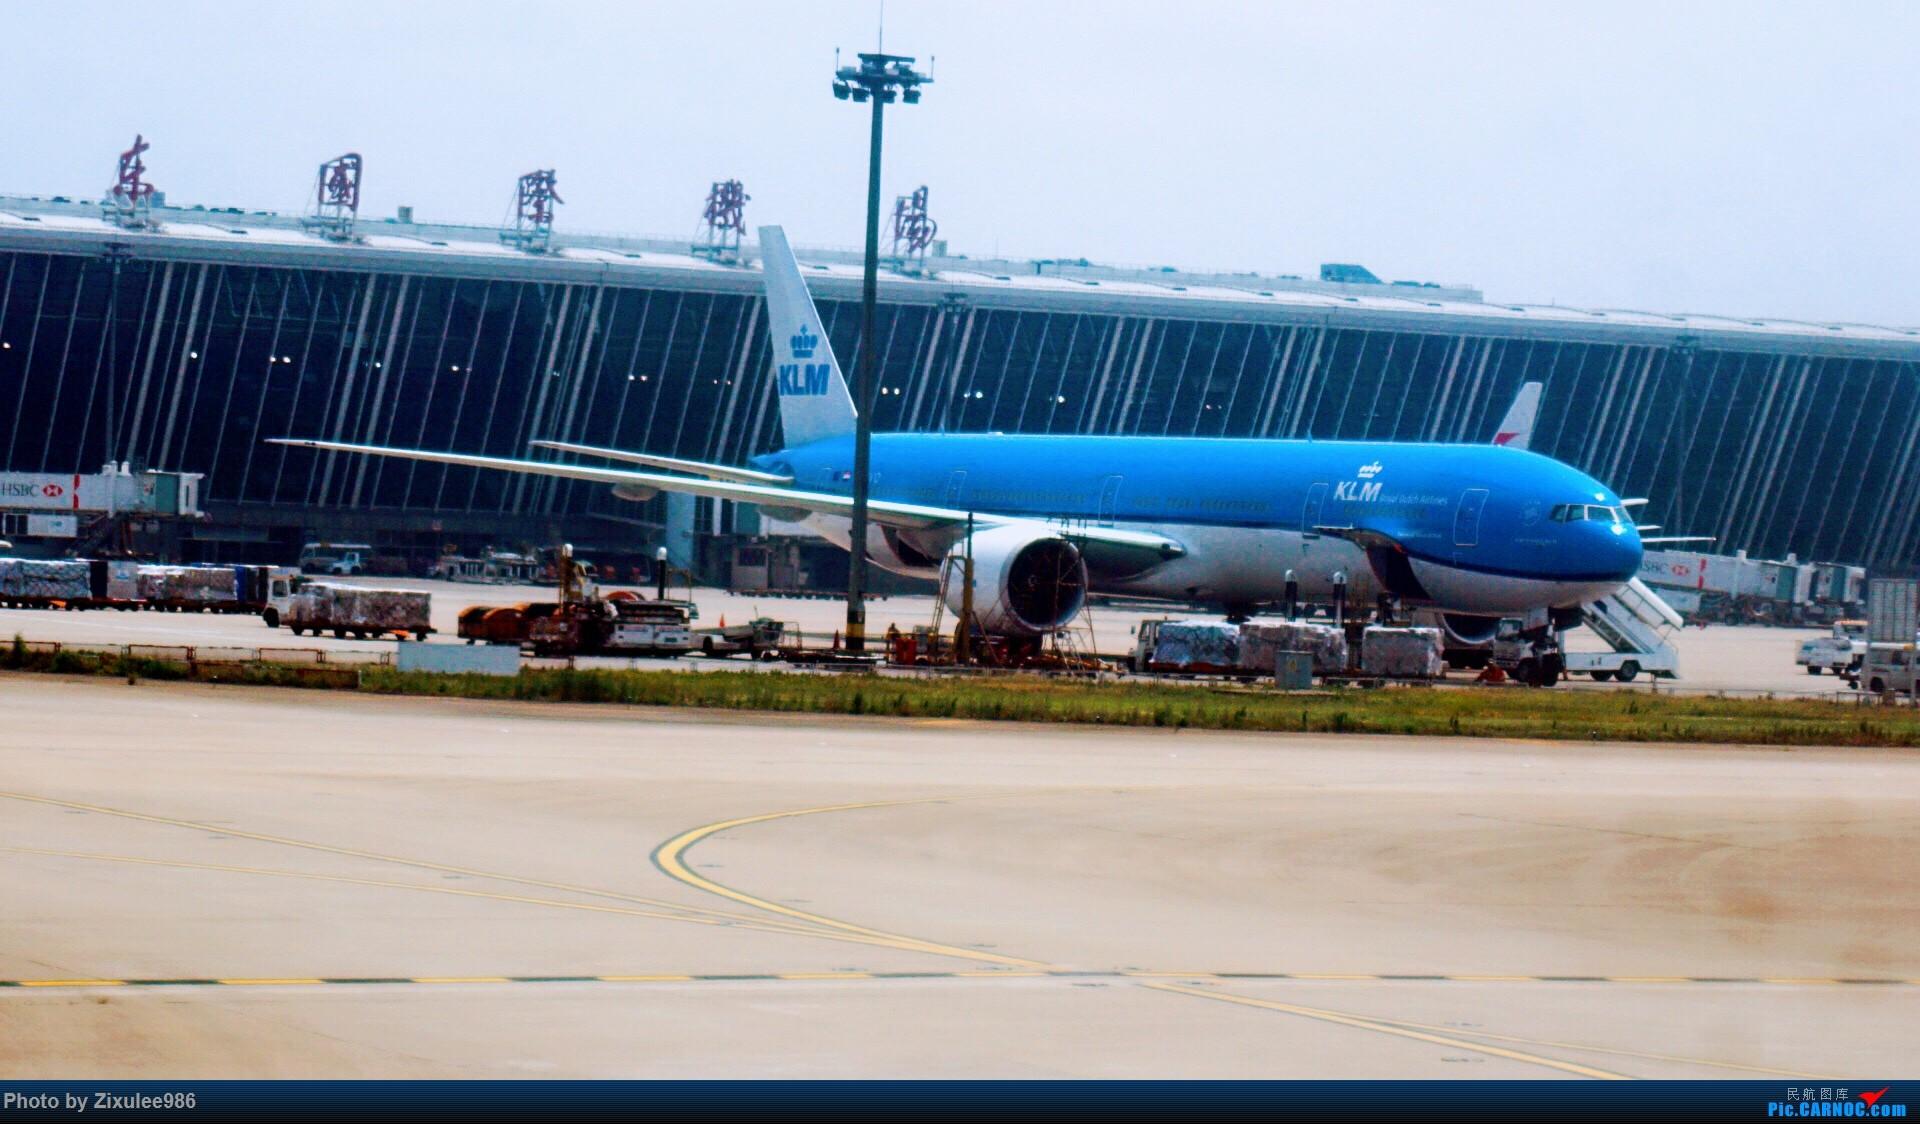 Re:[原创]加拿大21日游学之旅(一)~JJN-PVG-YYZ..(内含flightlog)~第一次发游记~多图缓更请谅解 BOEING 777-306(ER) PH-BVO 中国上海浦东国际机场